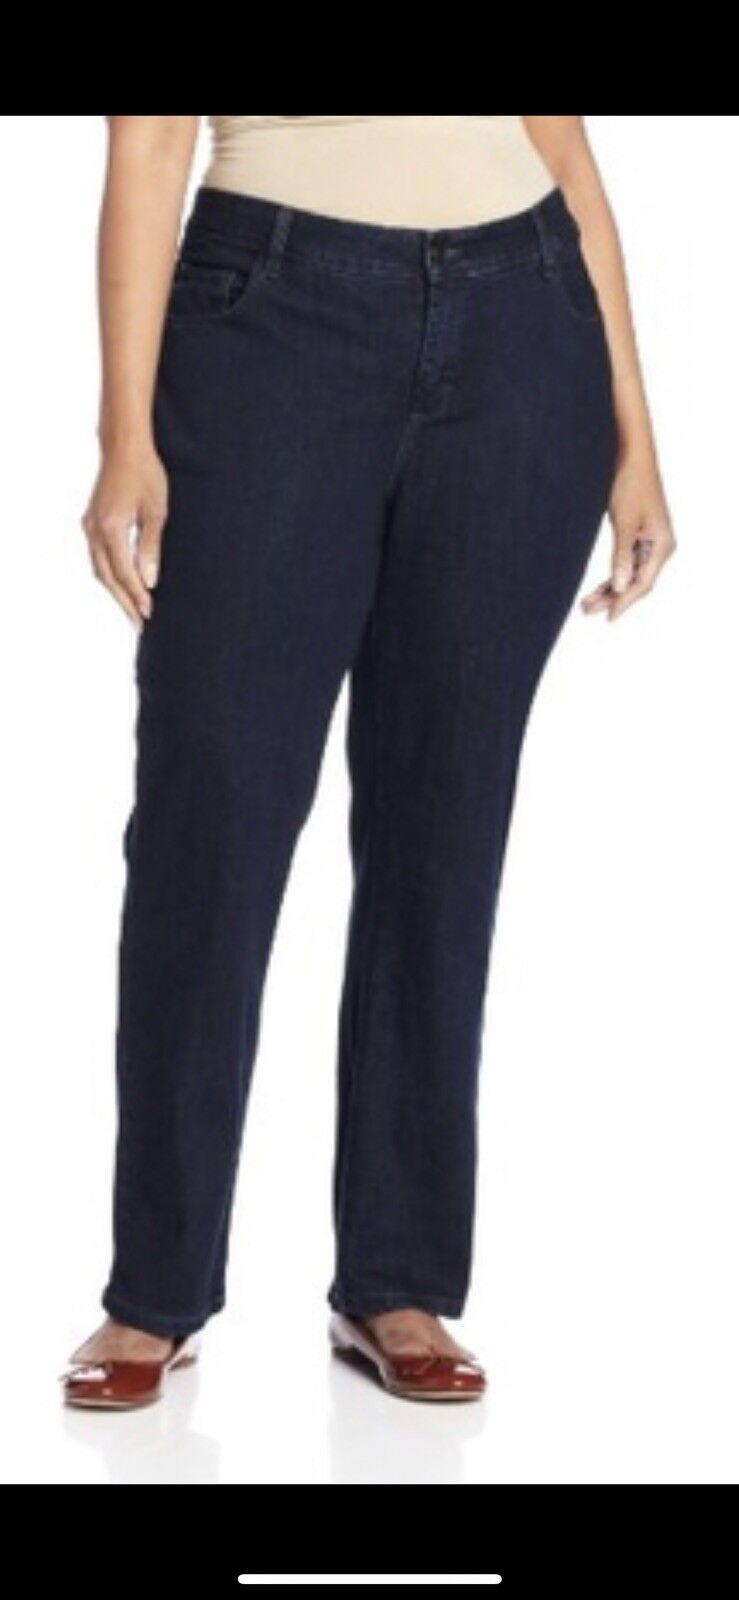 Lee Women's Jeans Petite Horizon bluee Straight Leg Stretch Plus Size 26W NWT